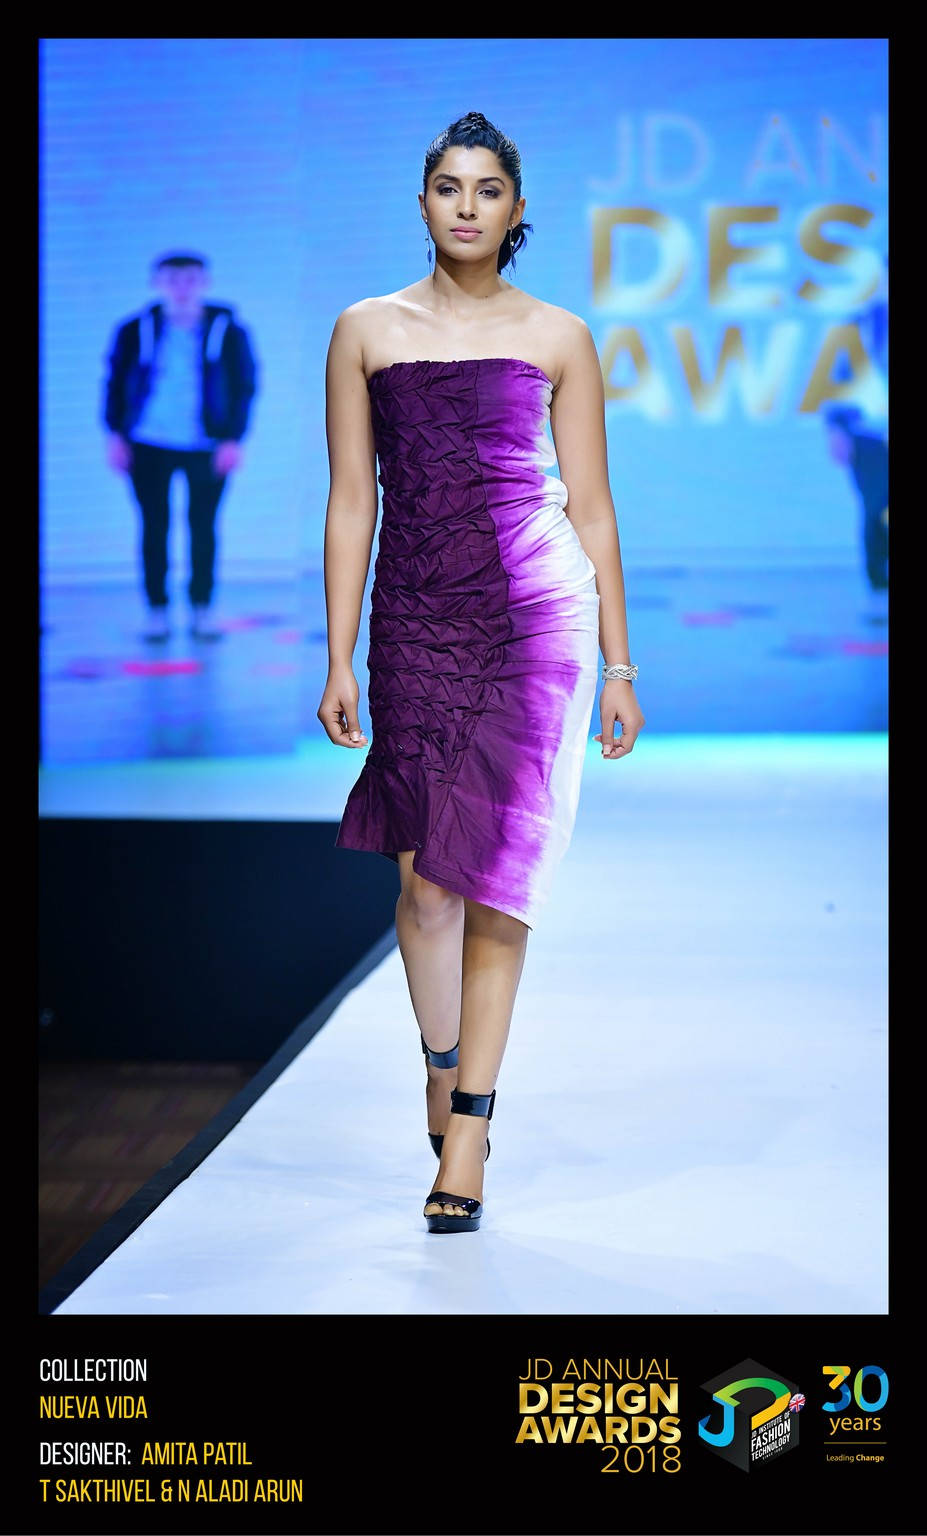 Nueva Vida – Change – JD Annual Design Awards 2018   Designer: Shakthi, Arun and Amitha   Photography : Jerin Nath (@jerin_nath) nueva vida - NUEVA VIDA 2 - Nueva Vida – Change – JD Annual Design Awards 2018